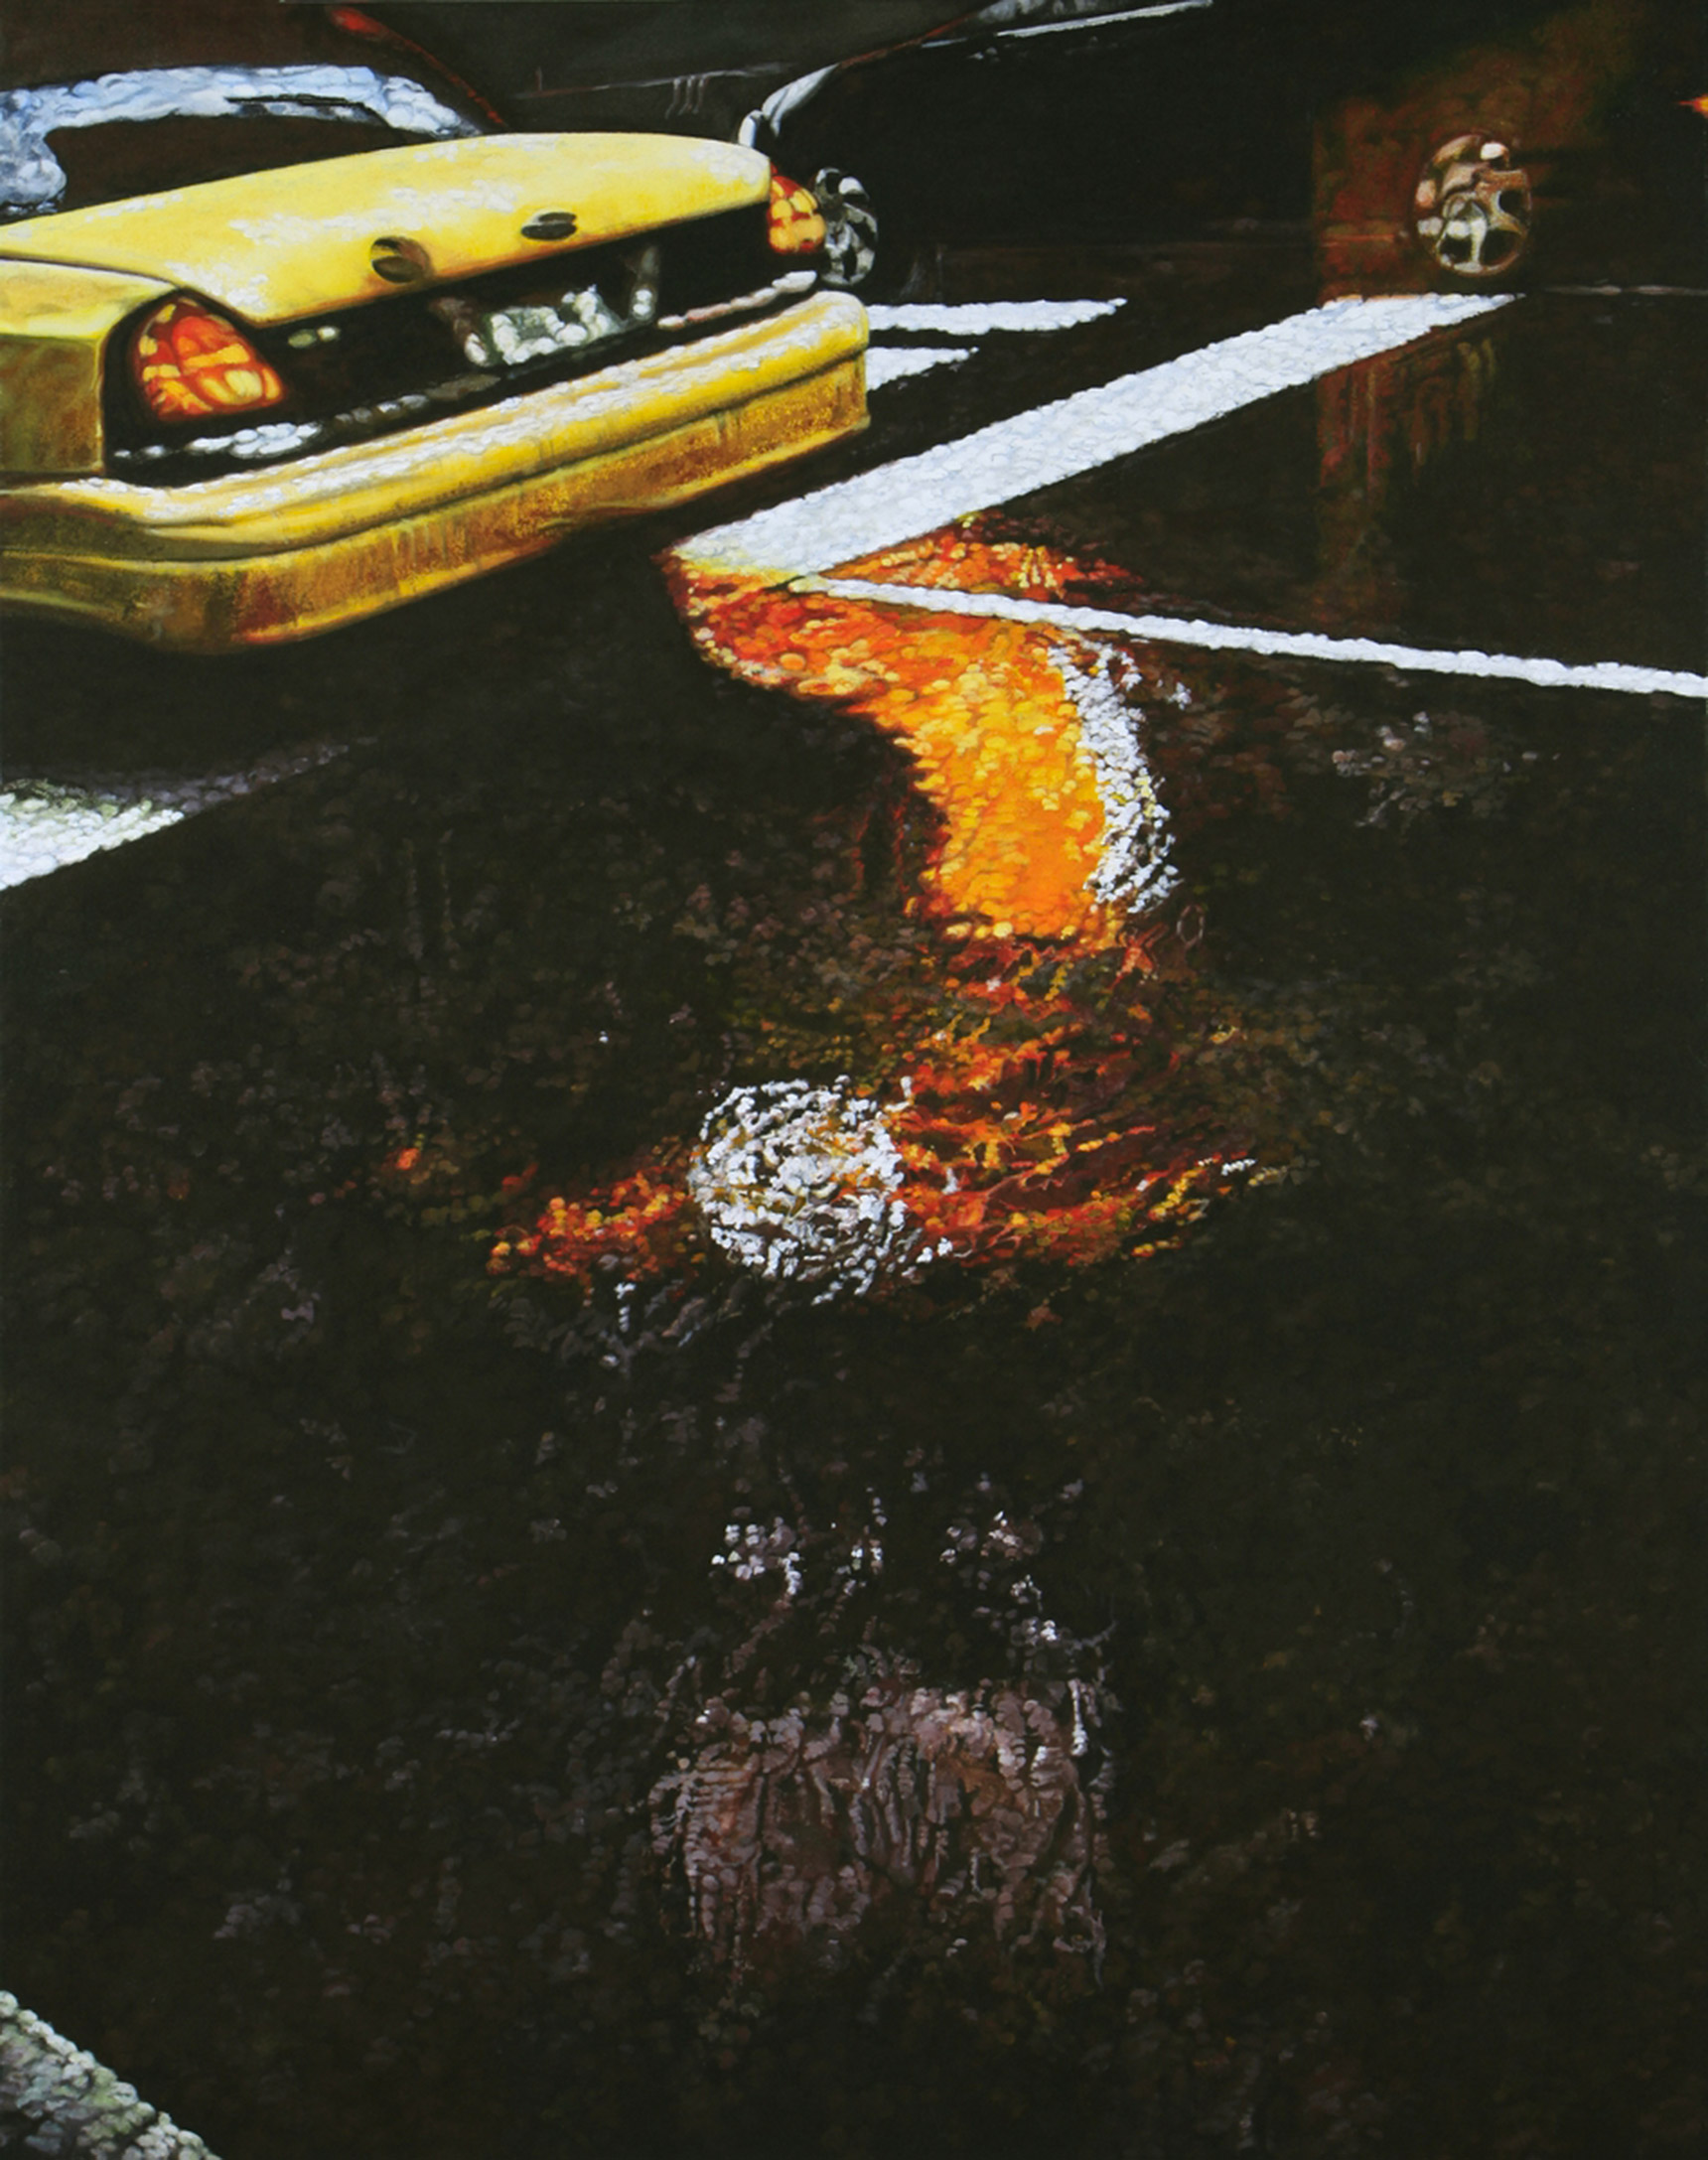 Peinture hyperréalisme Hervé Bernard : The puddle